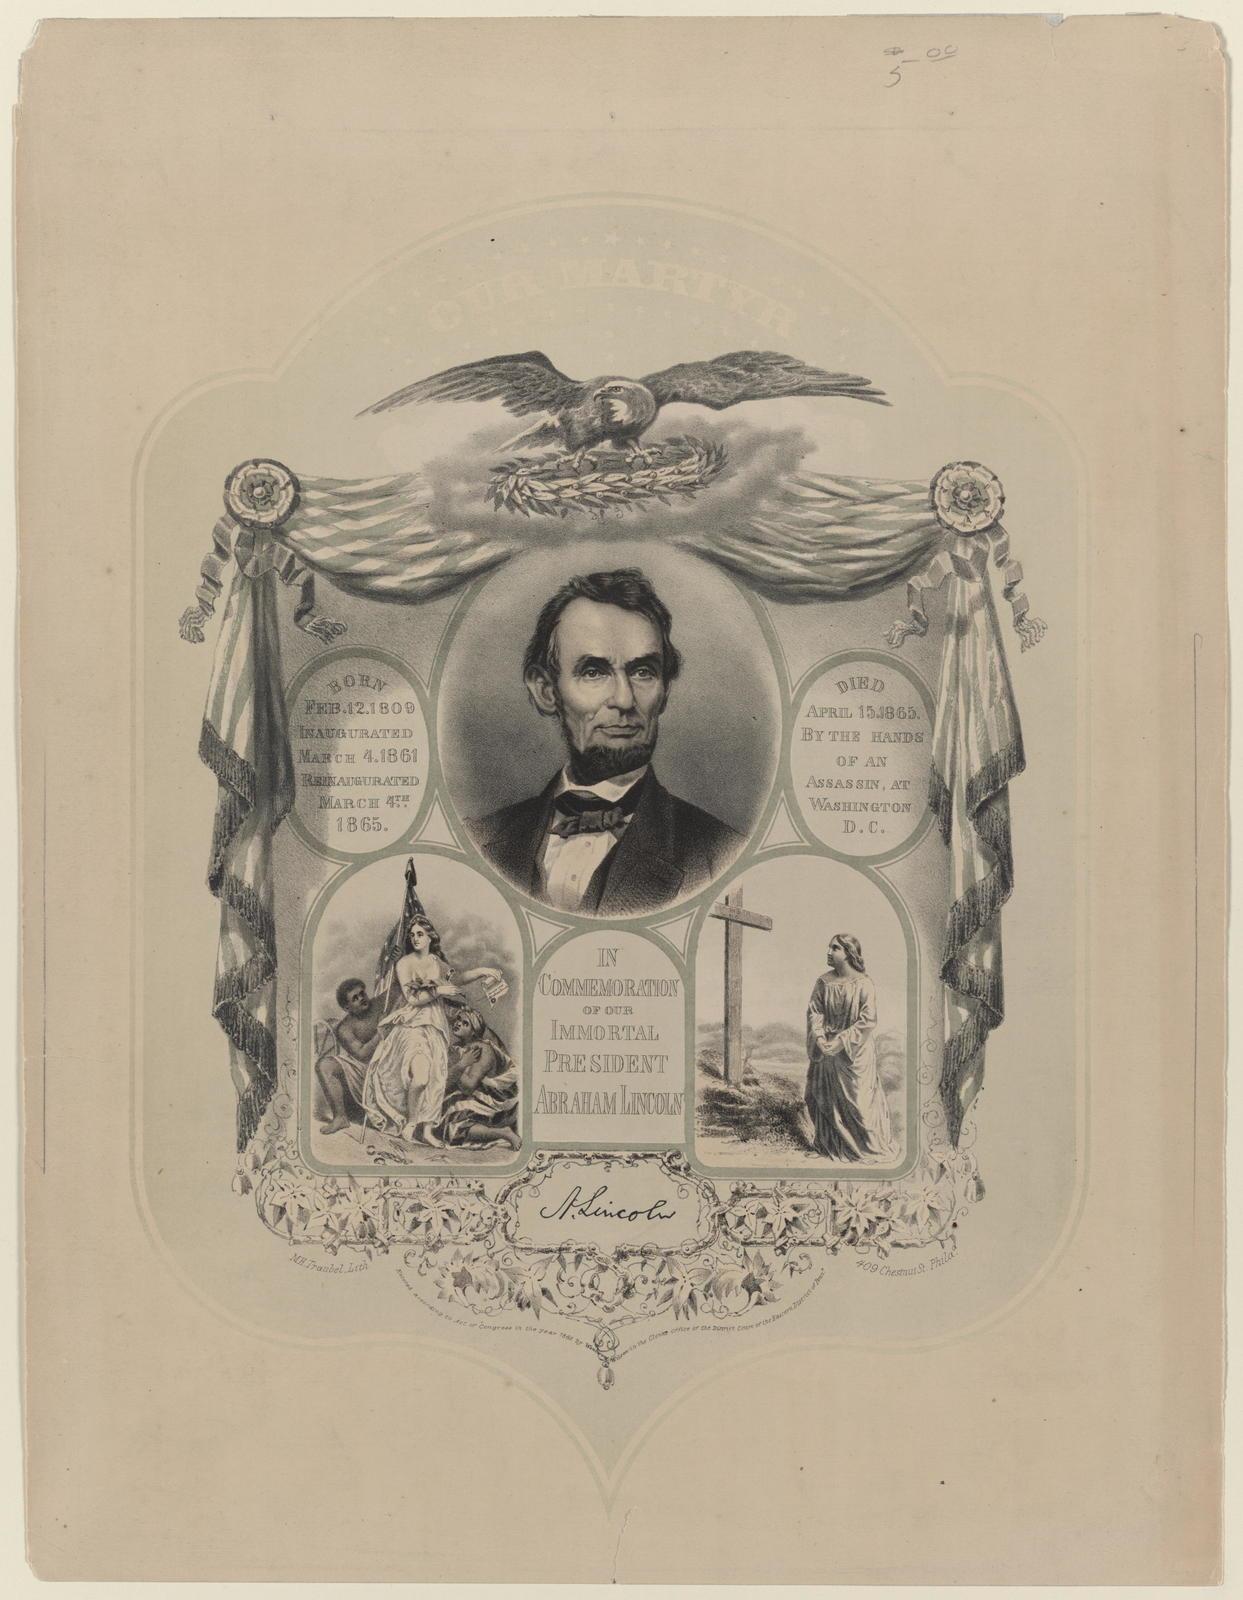 [Traubel portrait of Lincoln.]